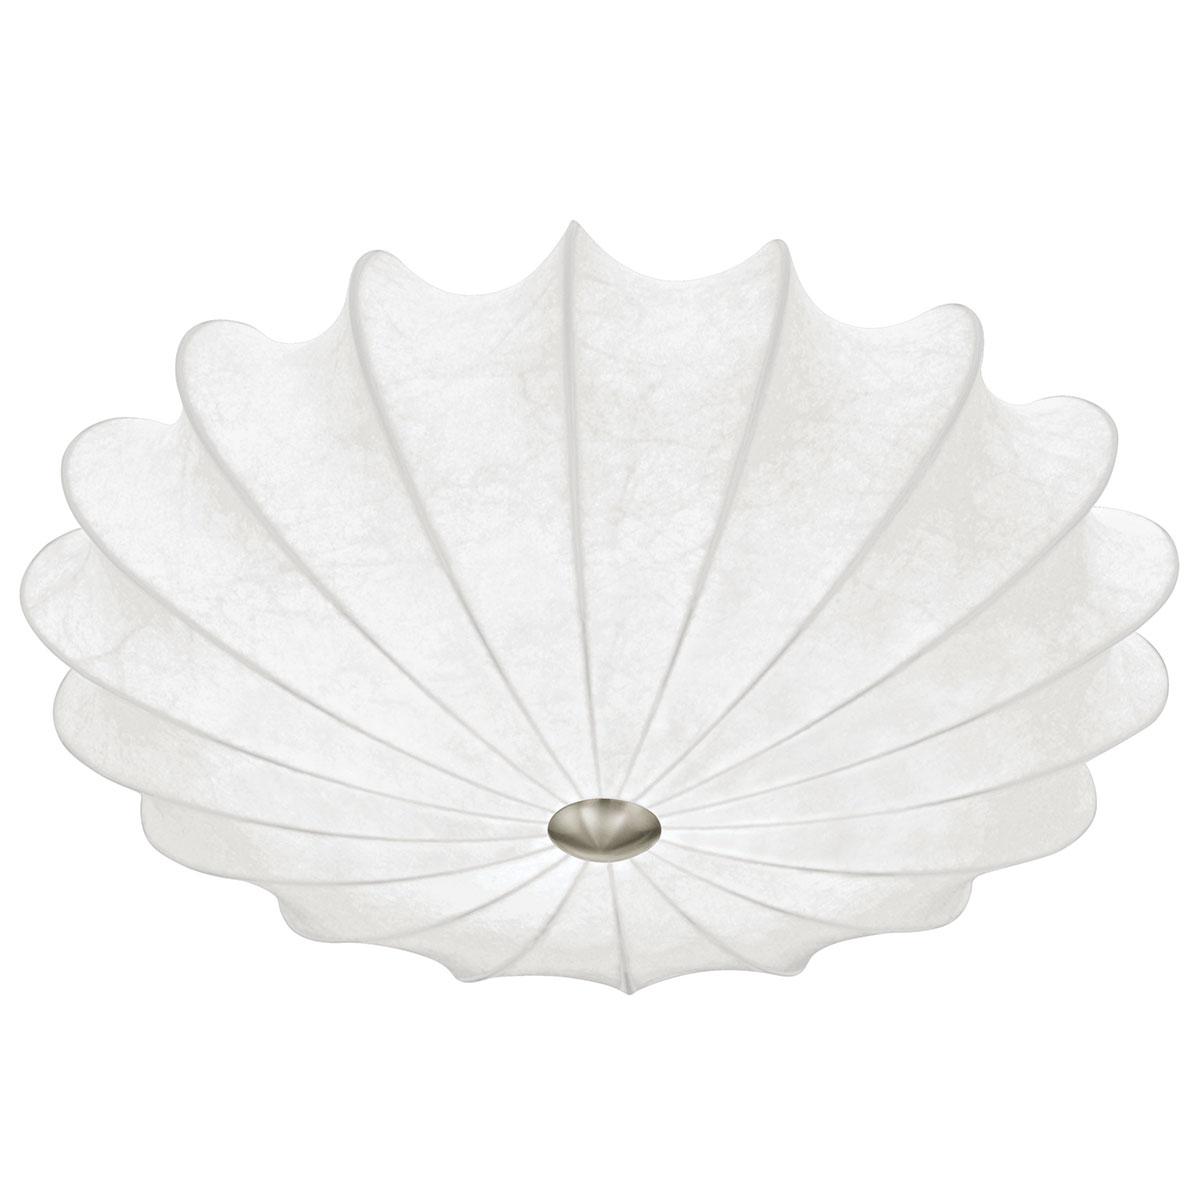 Image of   Eglo loftlampe - Cocoon - Sedilo - Hvid